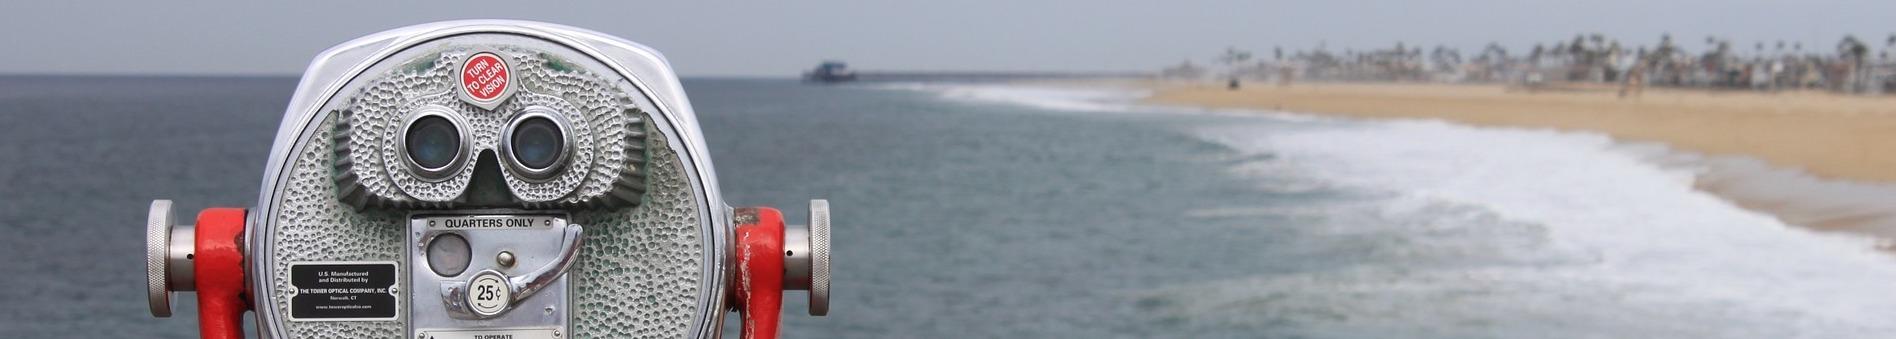 decorative image of binoculars looking at the sea